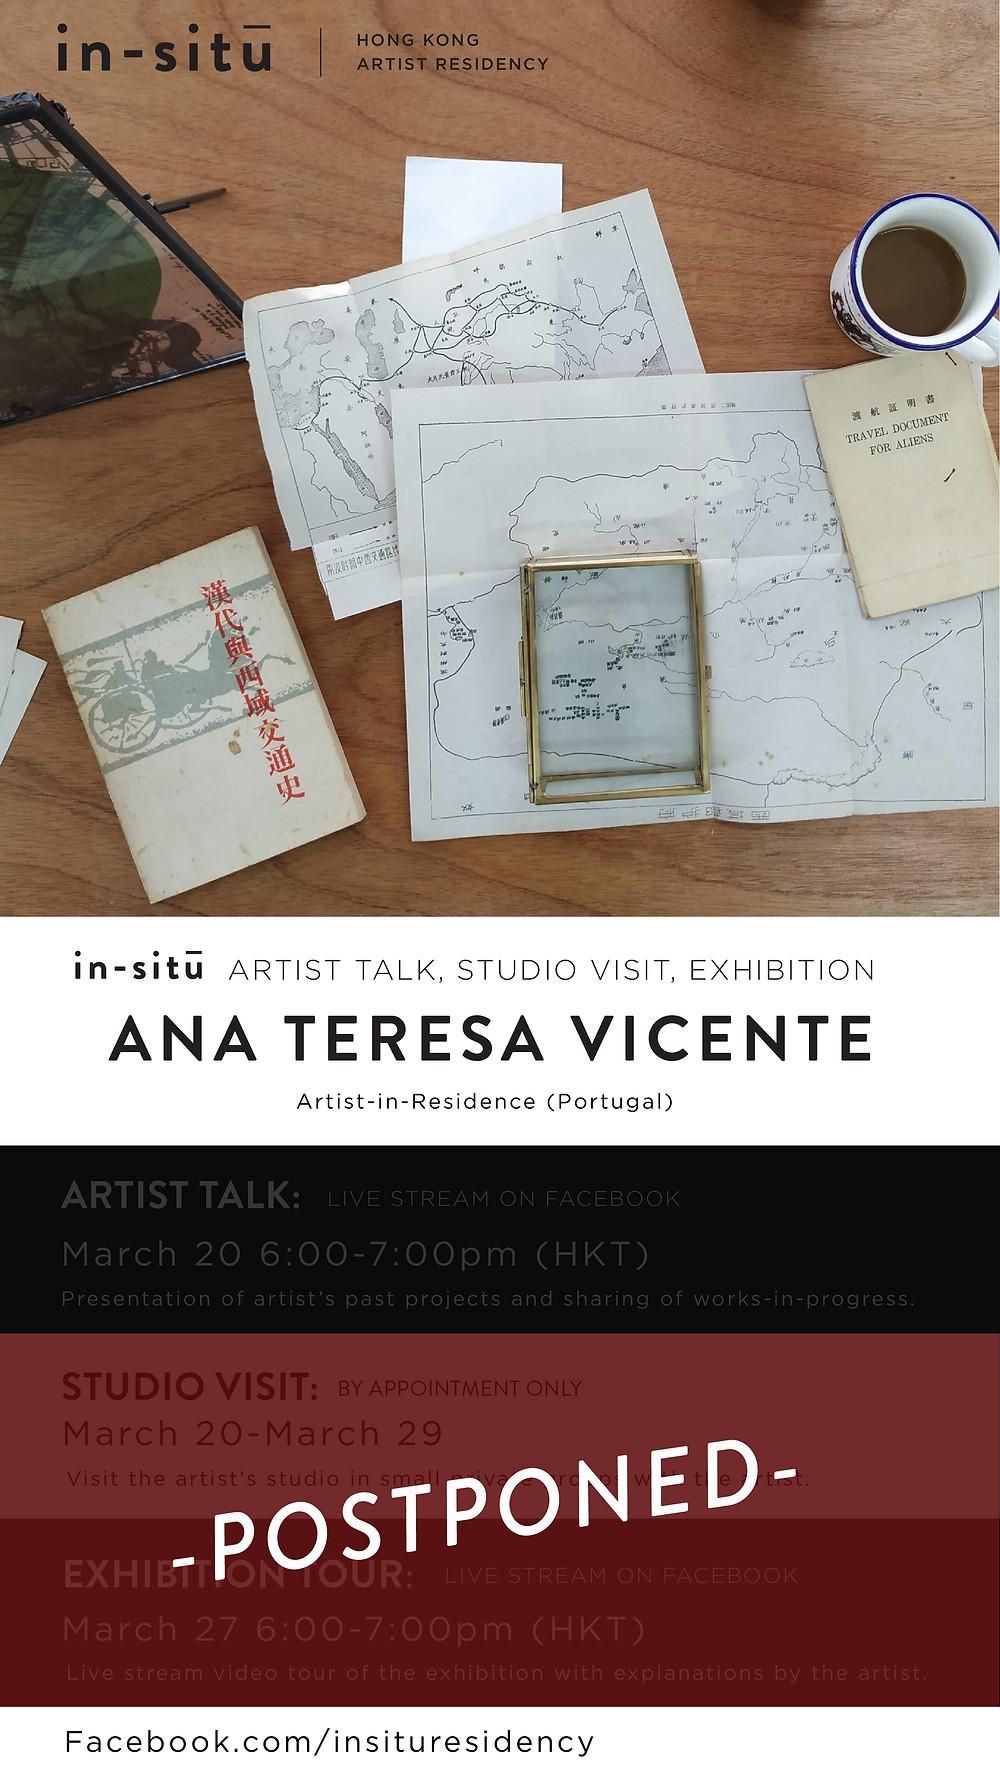 insitu artist residency open call